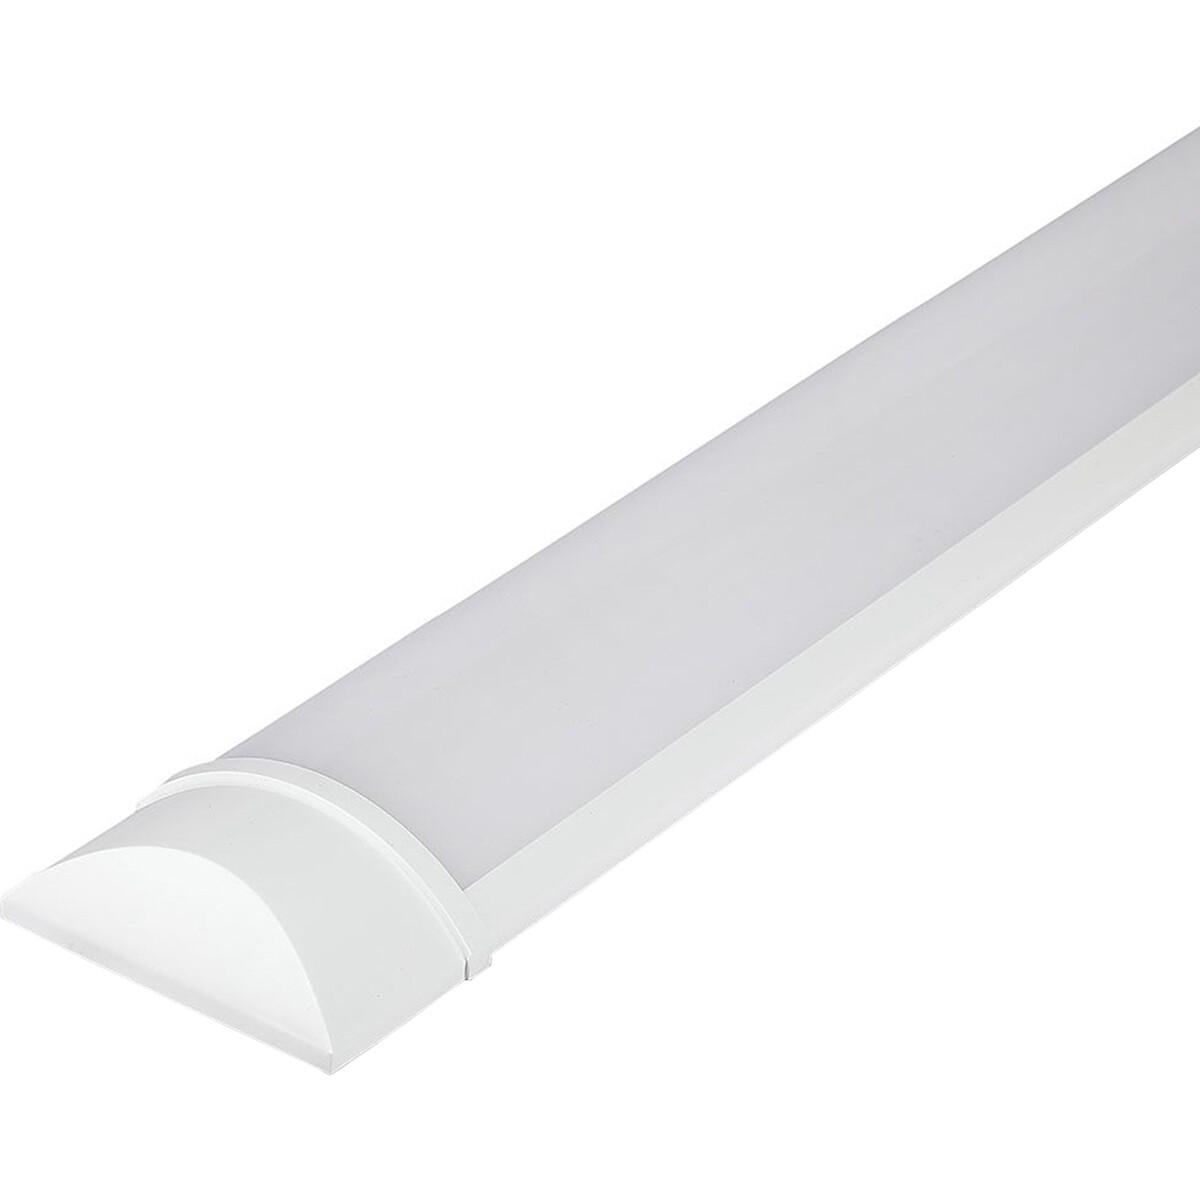 LED Balk - Viron Kilas - 38W High Lumen - Natuurlijk Wit 4000K - Mat Wit - Kunststof - 150cm